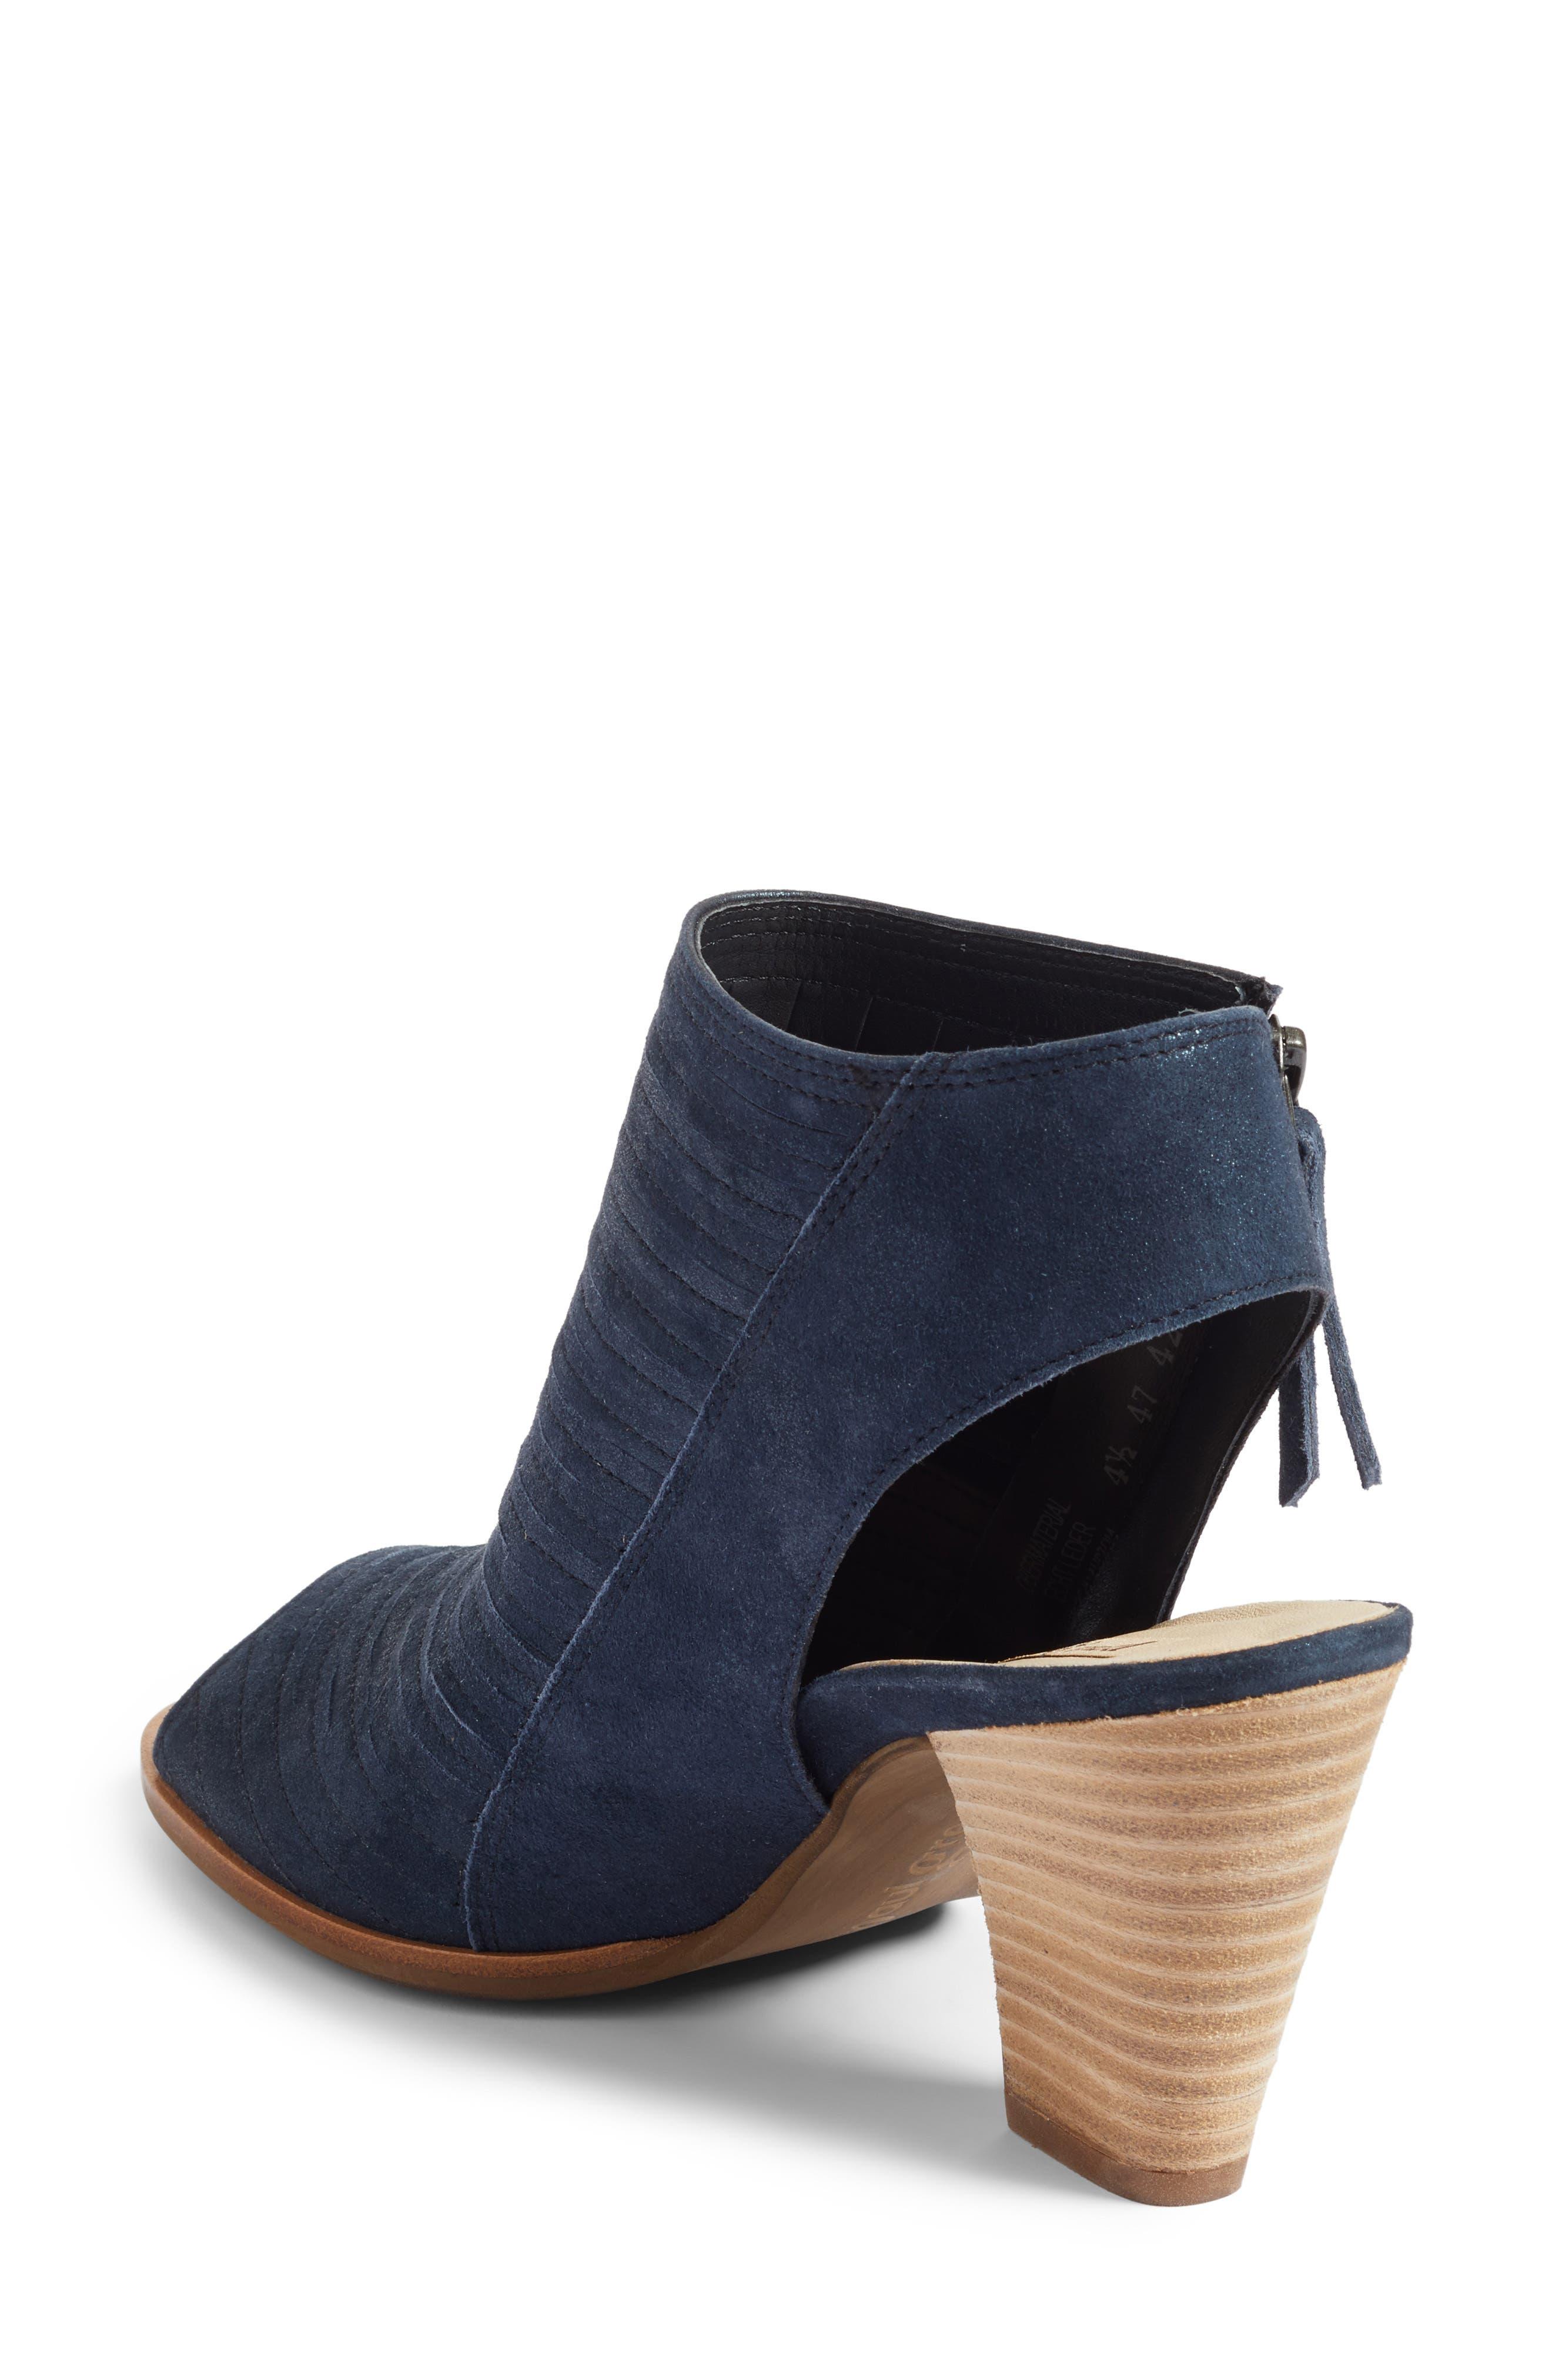 'Cayanne' Leather Peep Toe Sandal,                             Alternate thumbnail 18, color,